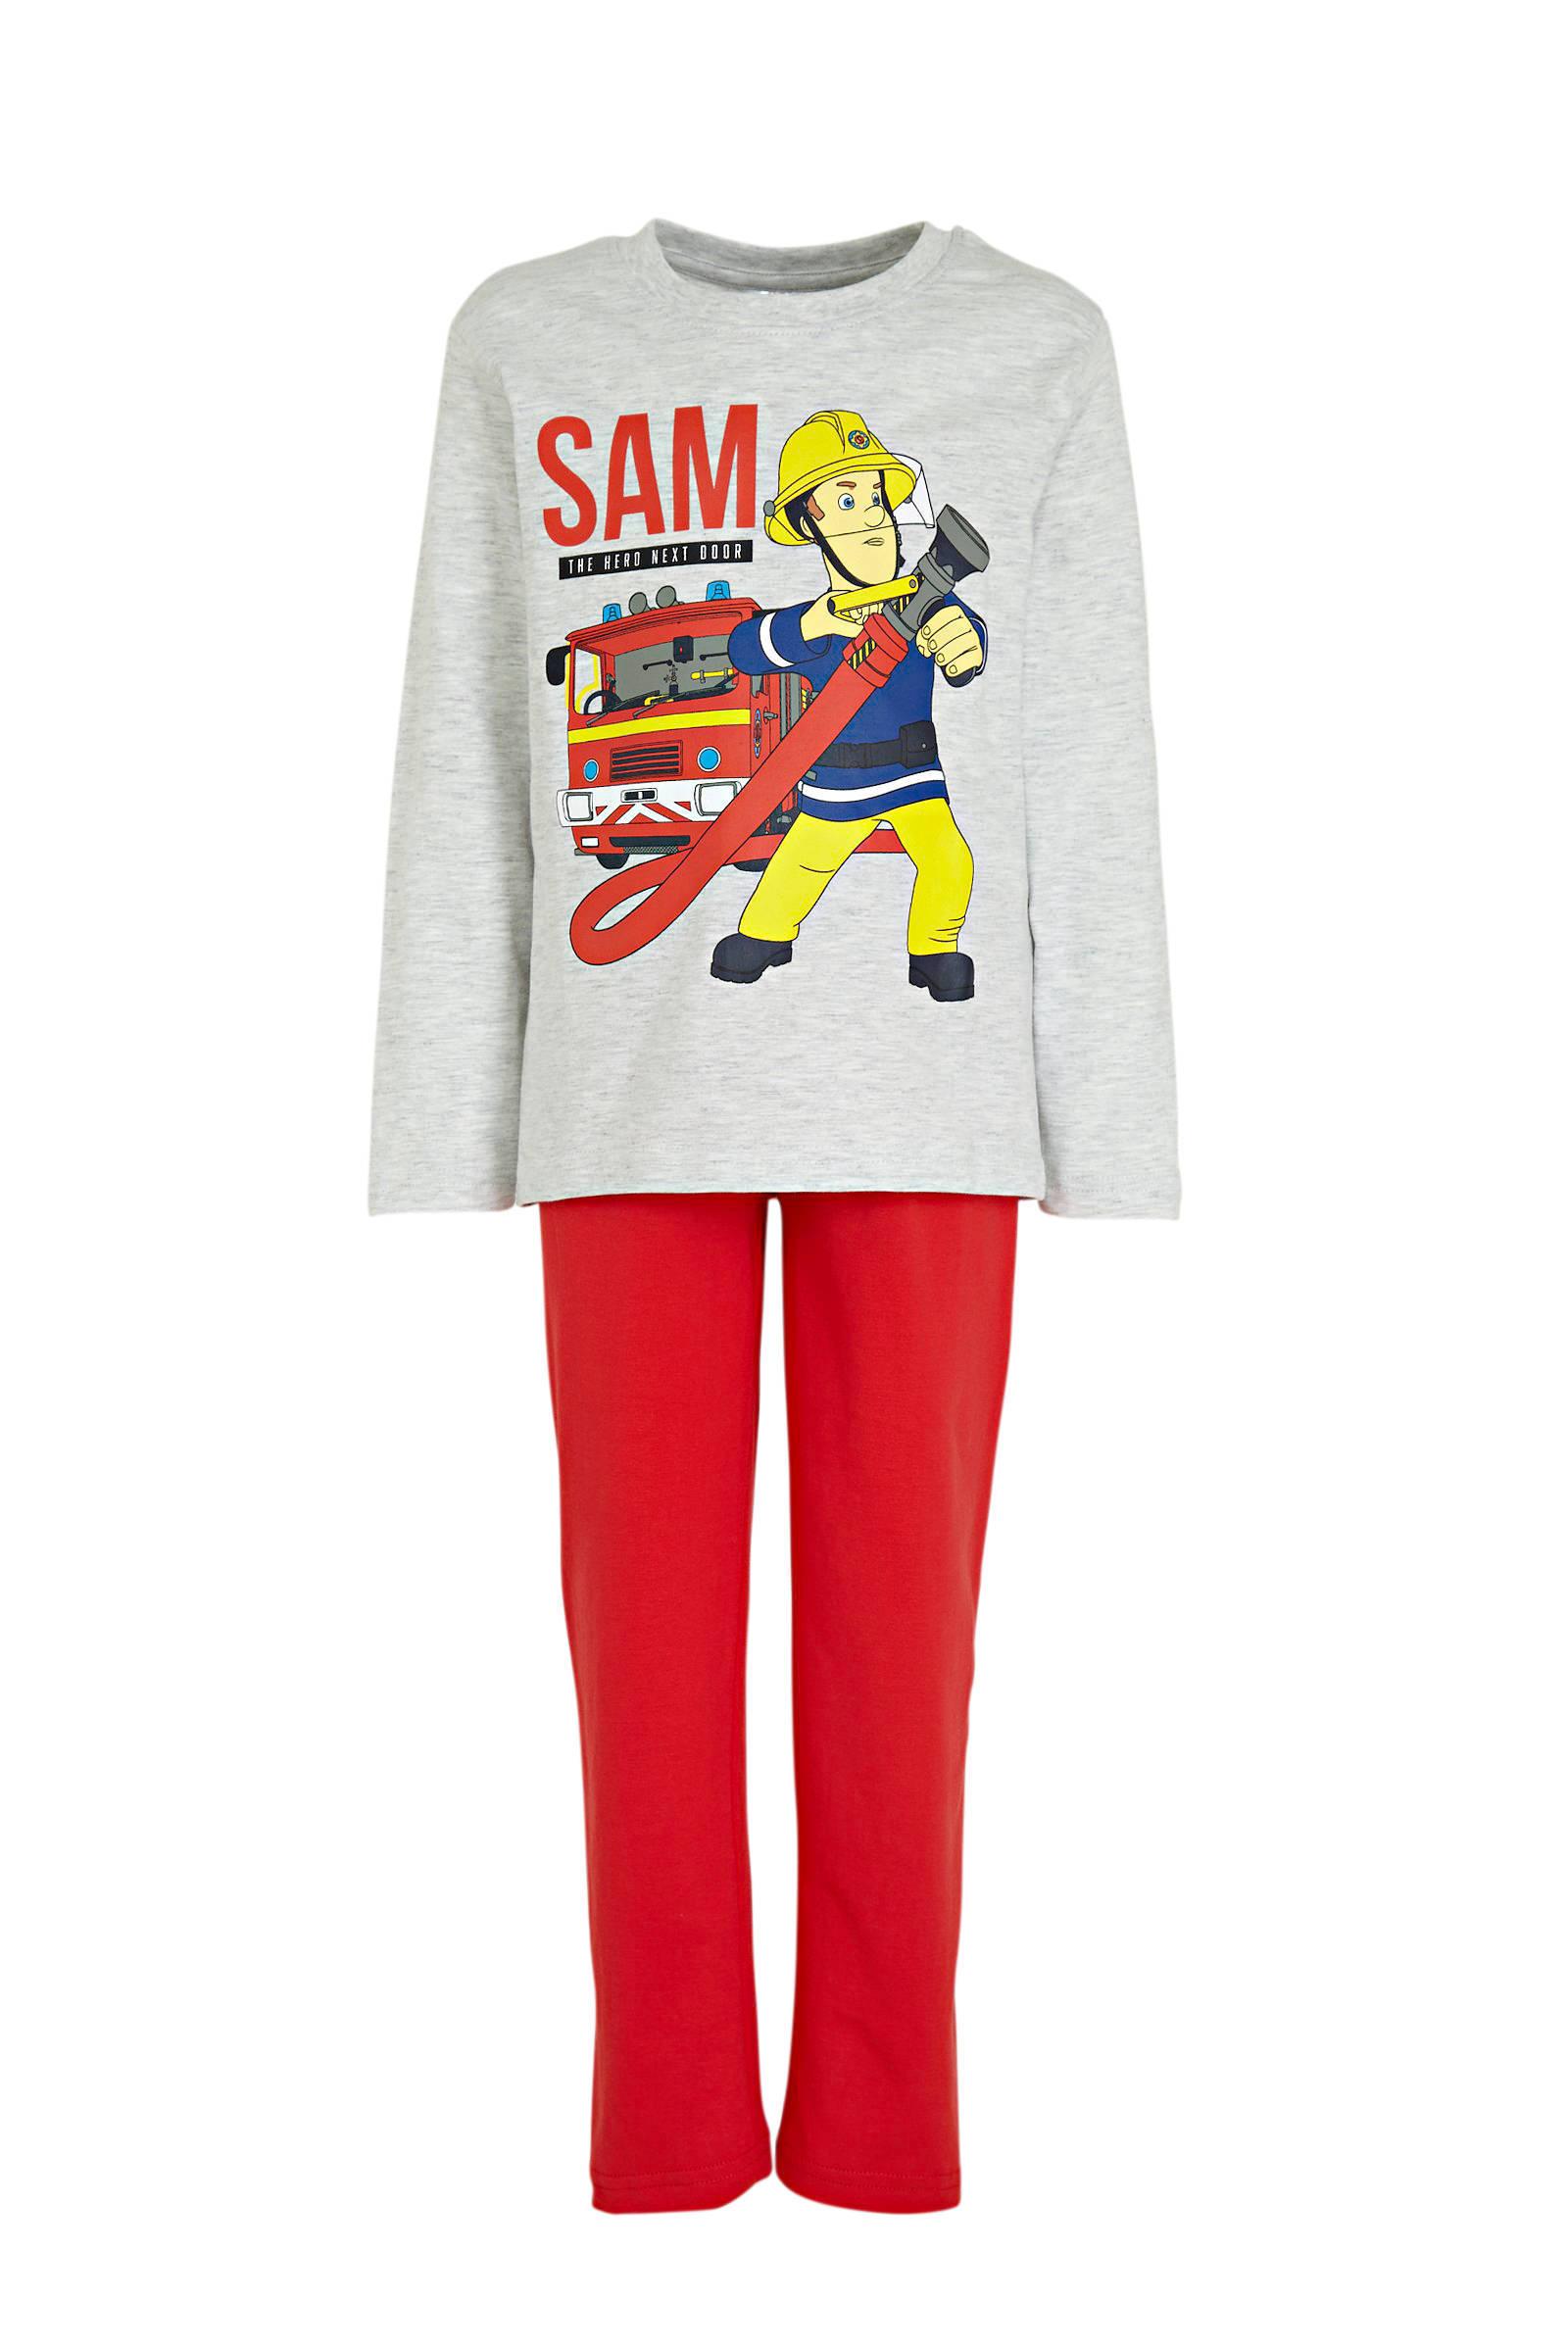 C&A Palomino Brandweerman Sam pyjama roodblauw | wehkamp